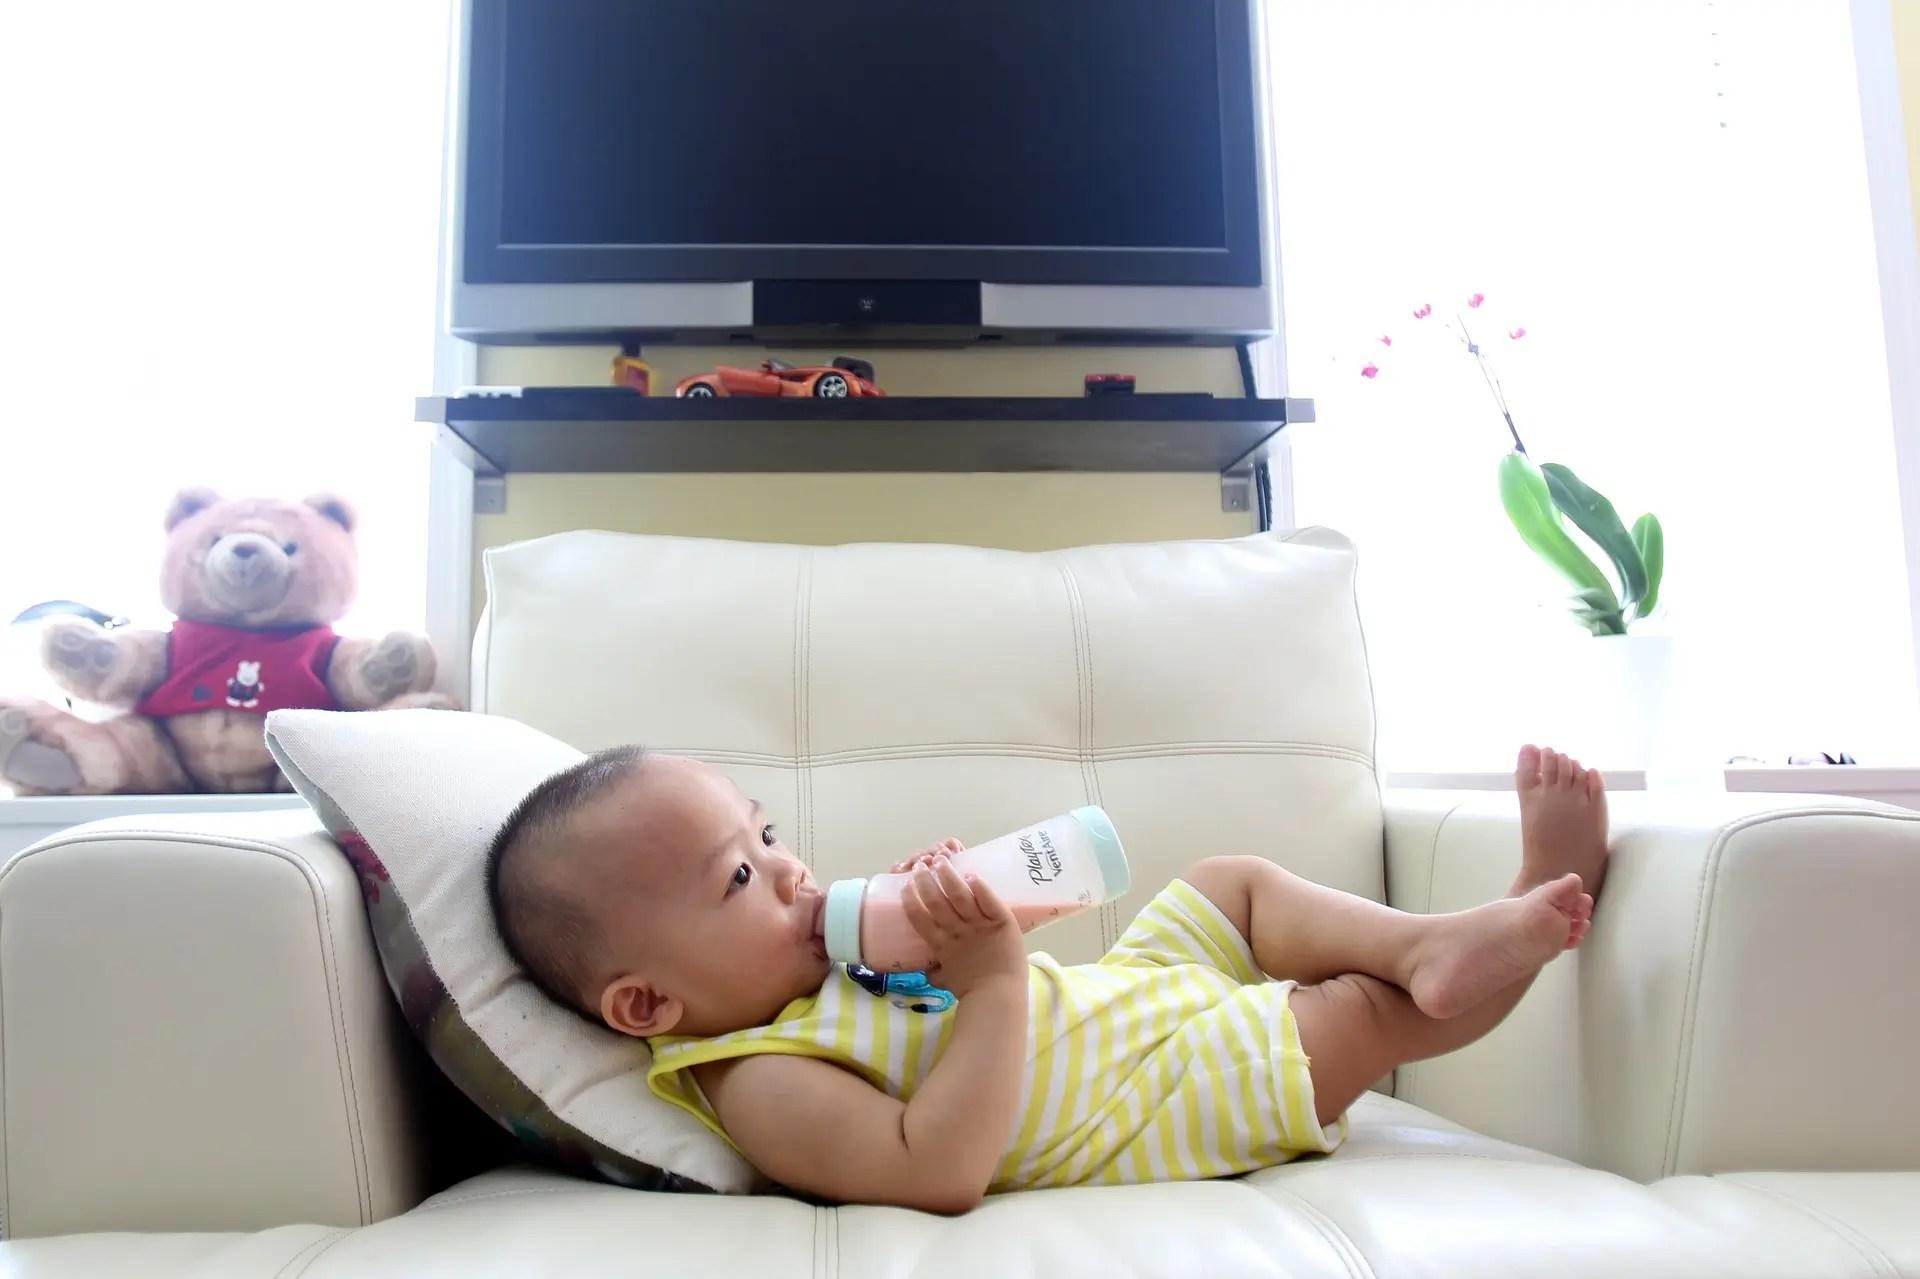 Baby drinking milk on a sofa